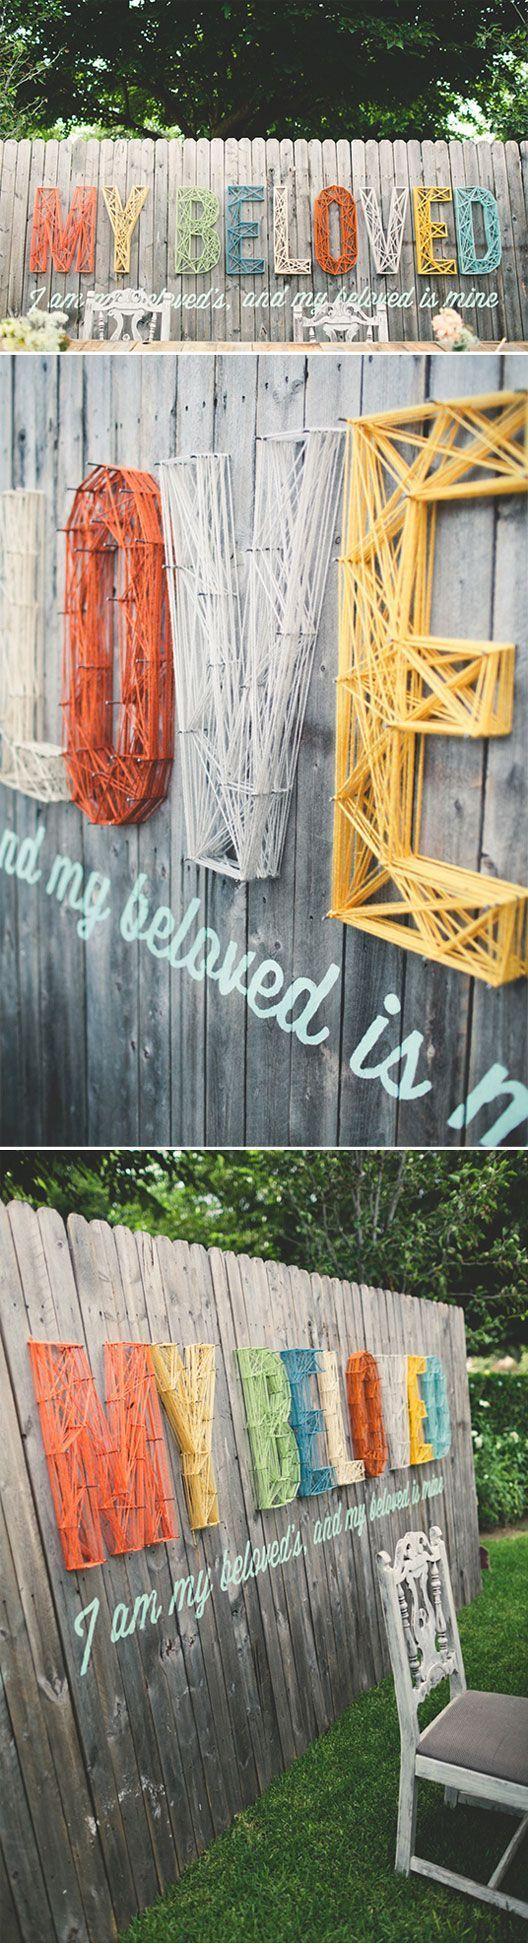 Homemade garden art ideas - Ideas Sorprendentes Para Decorar La Valla De Tu Jard N